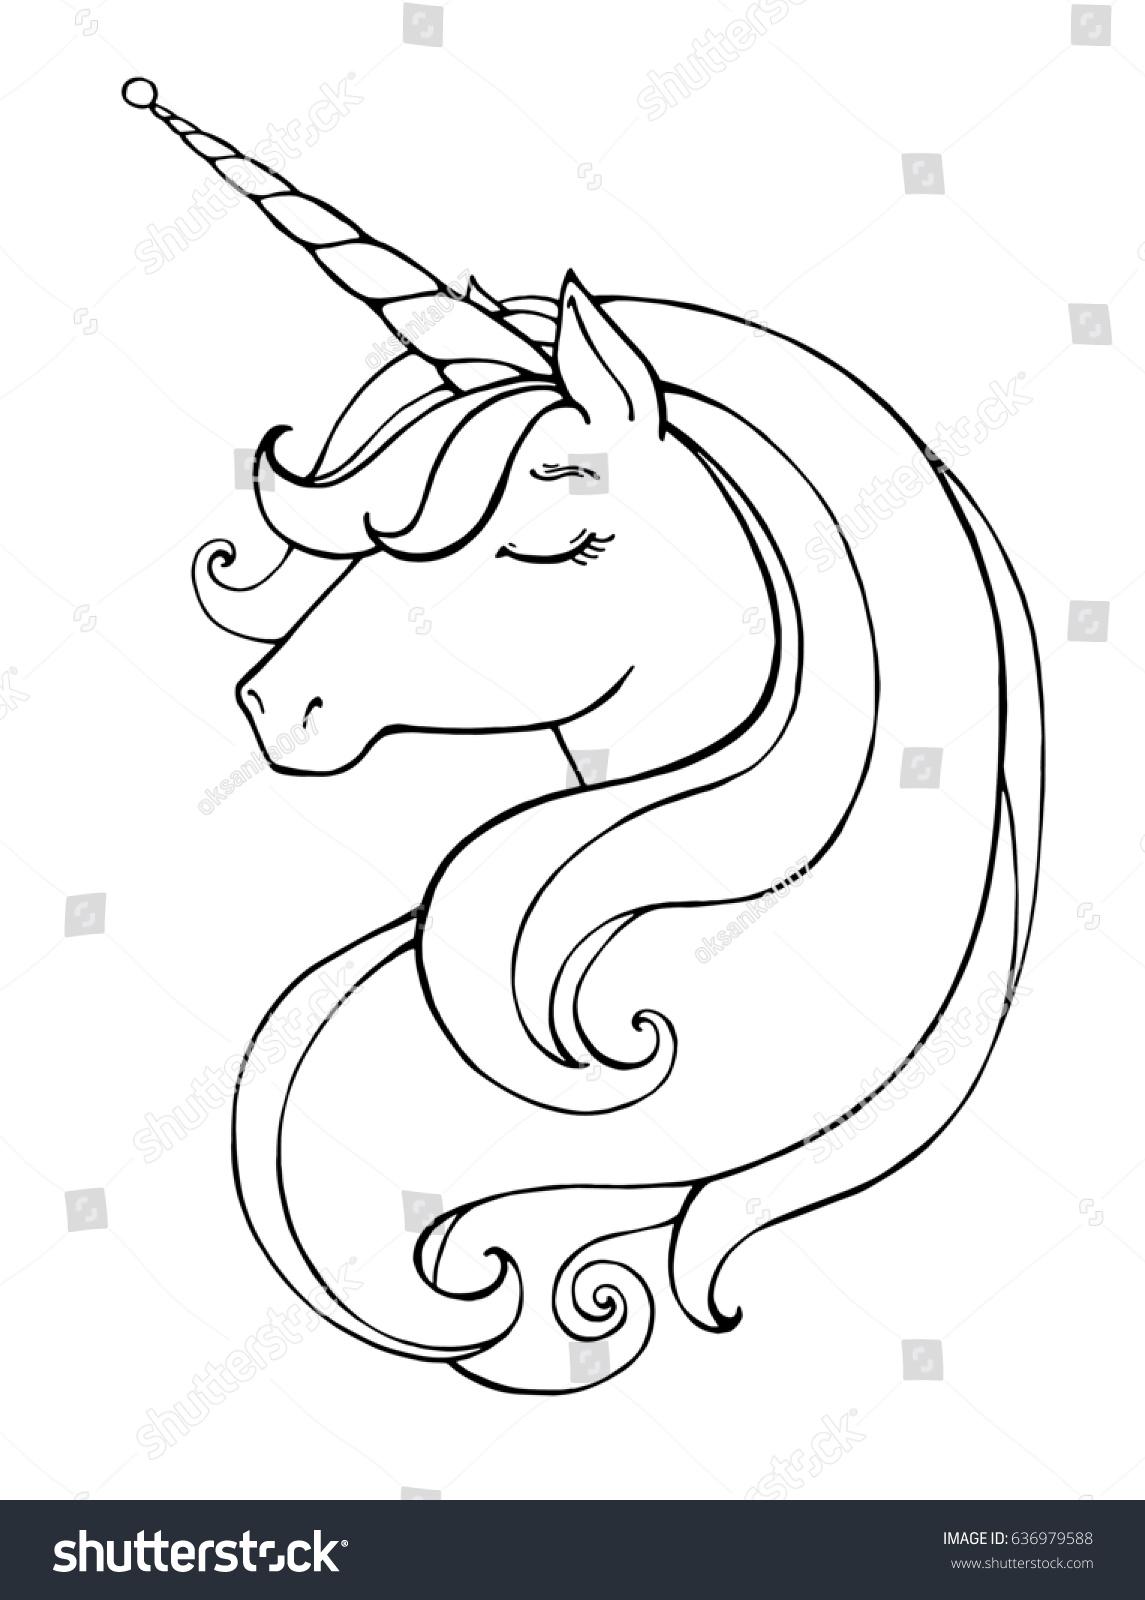 Unicorn Magical Animal Vector Artwork Black Stock Vector 636979588 ...